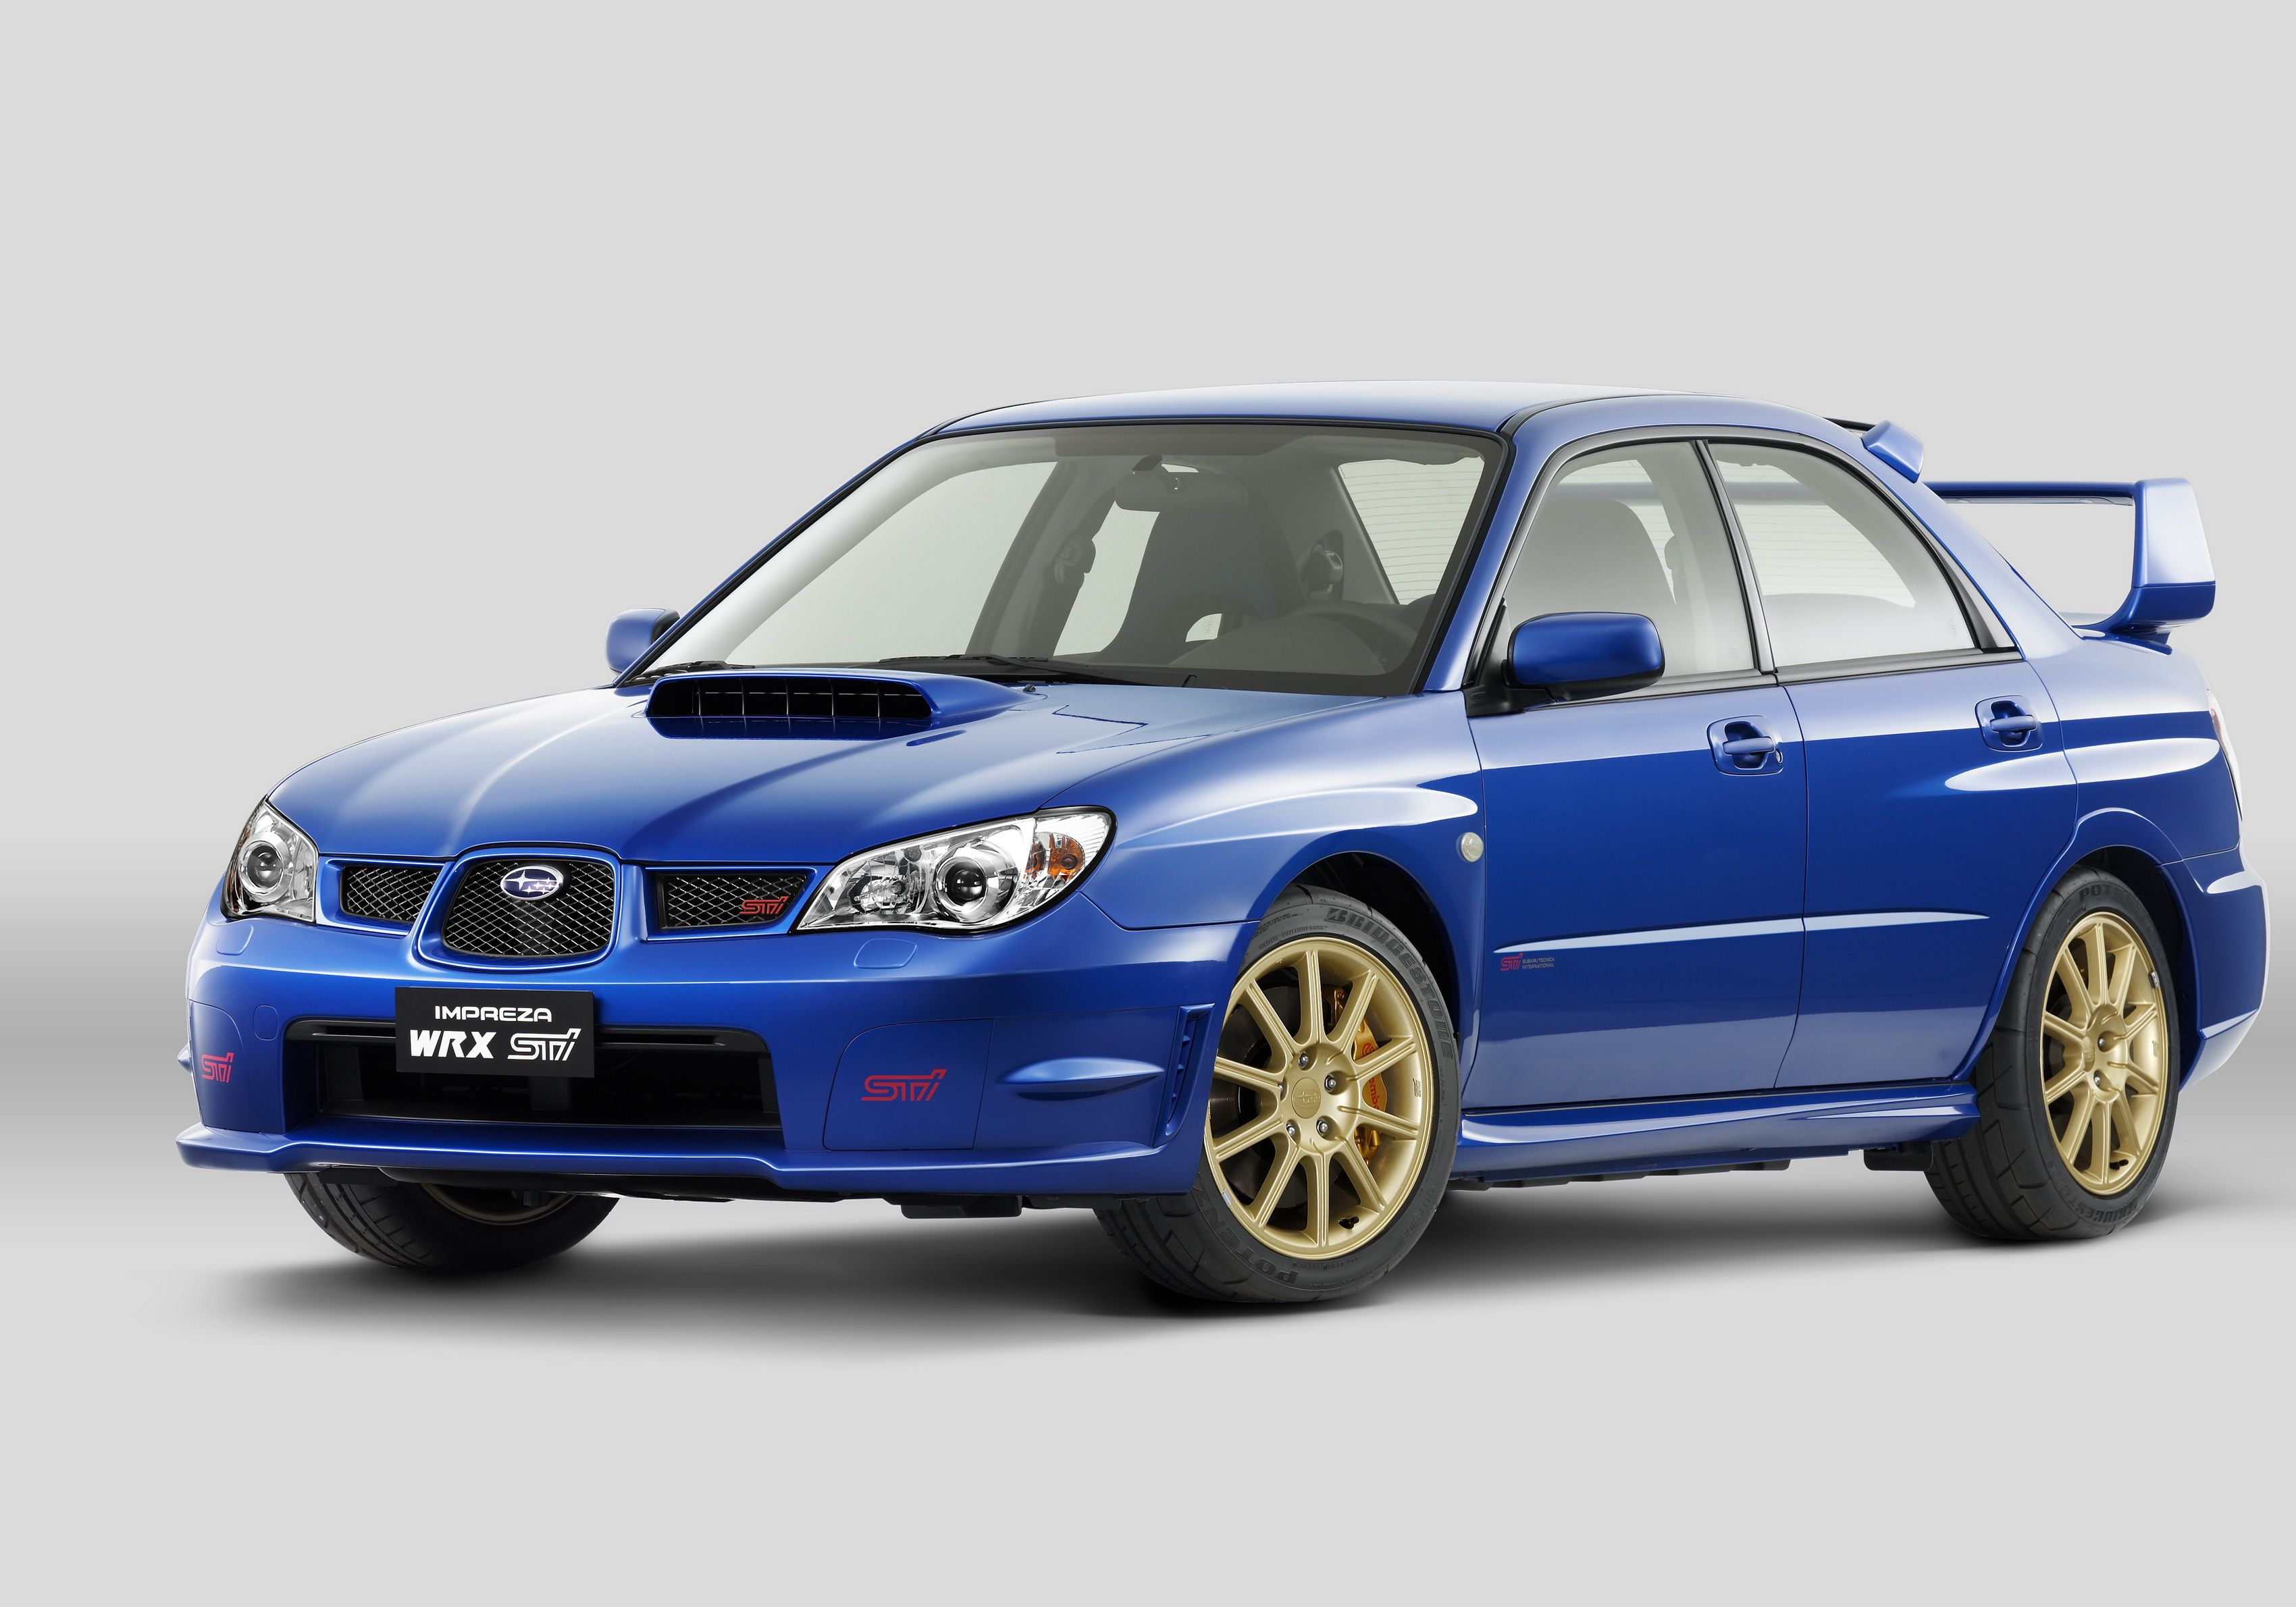 2005 Subaru Impreza Wrx Sti Subaru Subaru Wrx Sti Subaru Impreza